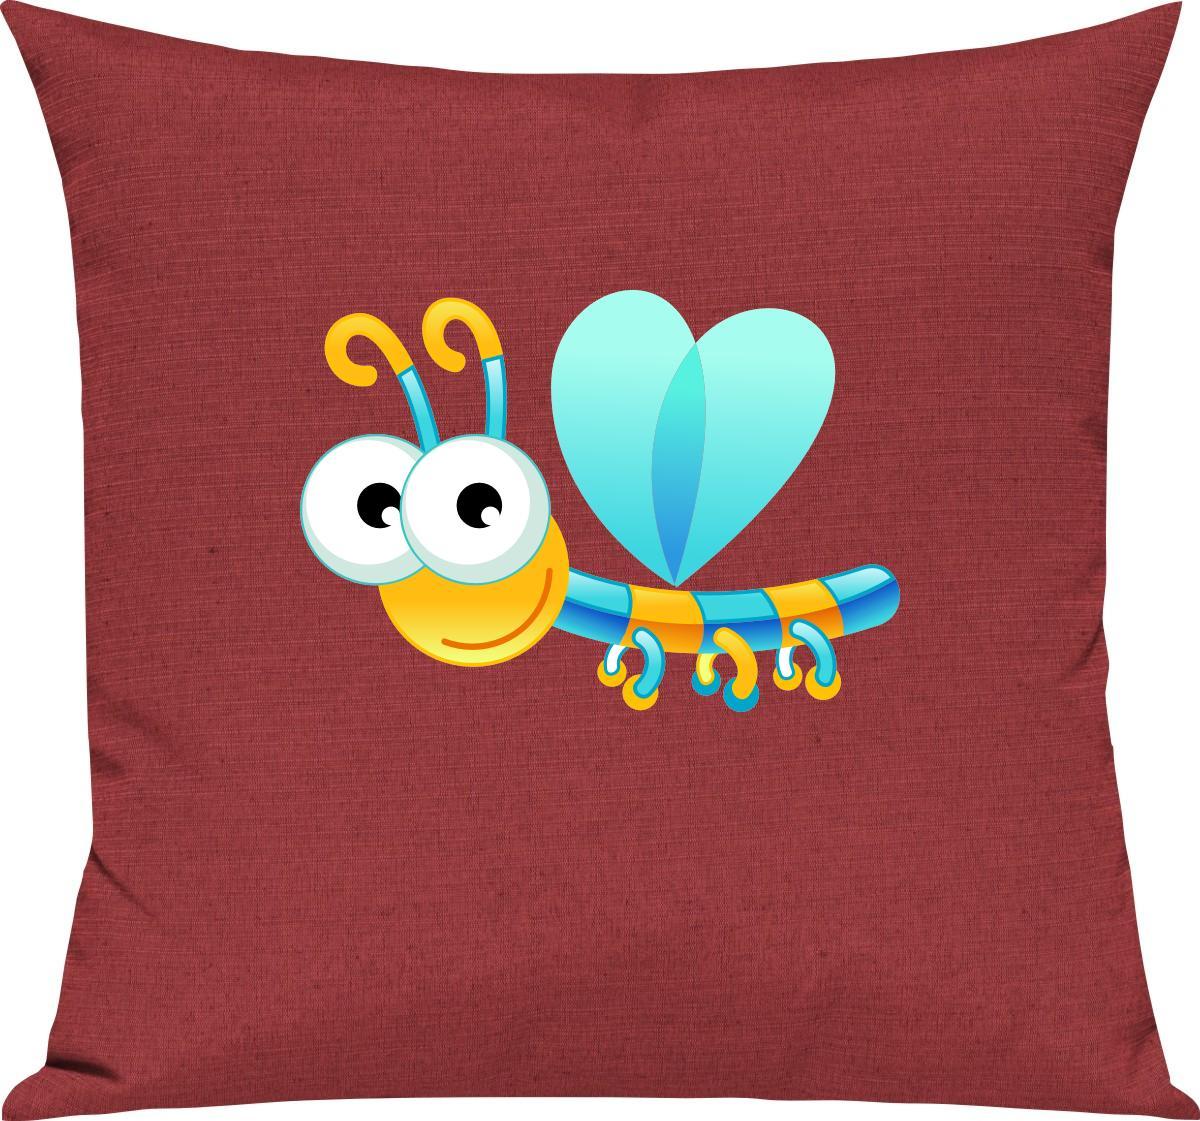 Indexbild 13 - Kinder Kissen, Libelle Insekt Tiere Tier Natur, Kuschelkissen Couch Deko,